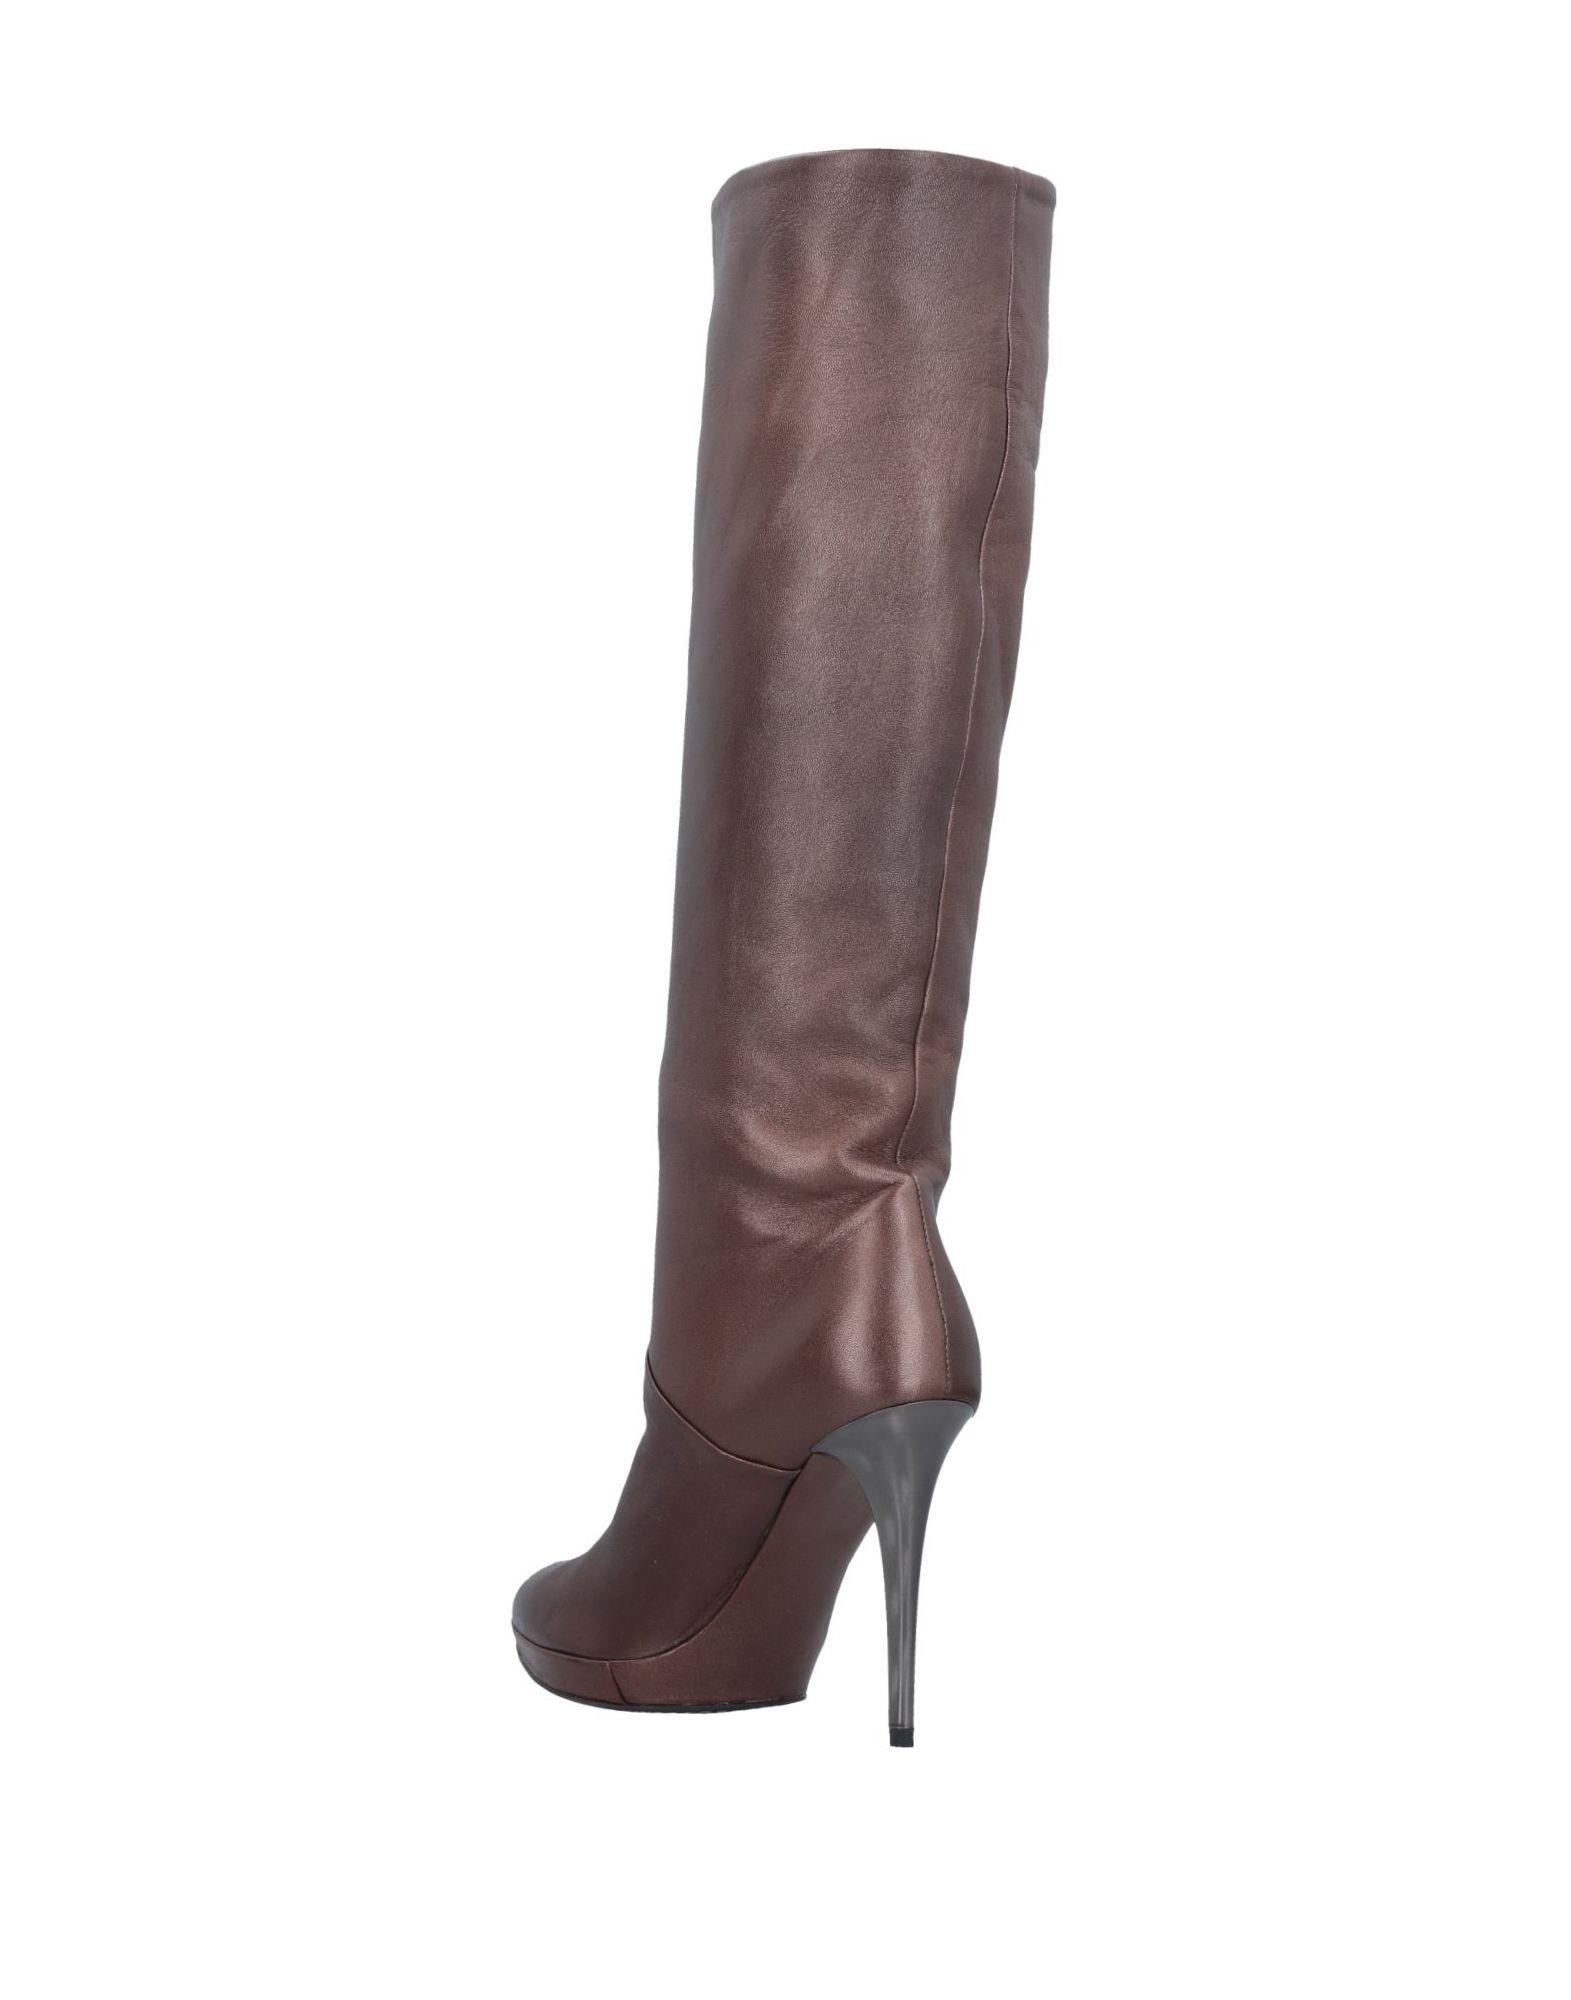 Ninalilou aussehende Stiefel Damen  11508059IQGut aussehende Ninalilou strapazierfähige Schuhe f3f24f